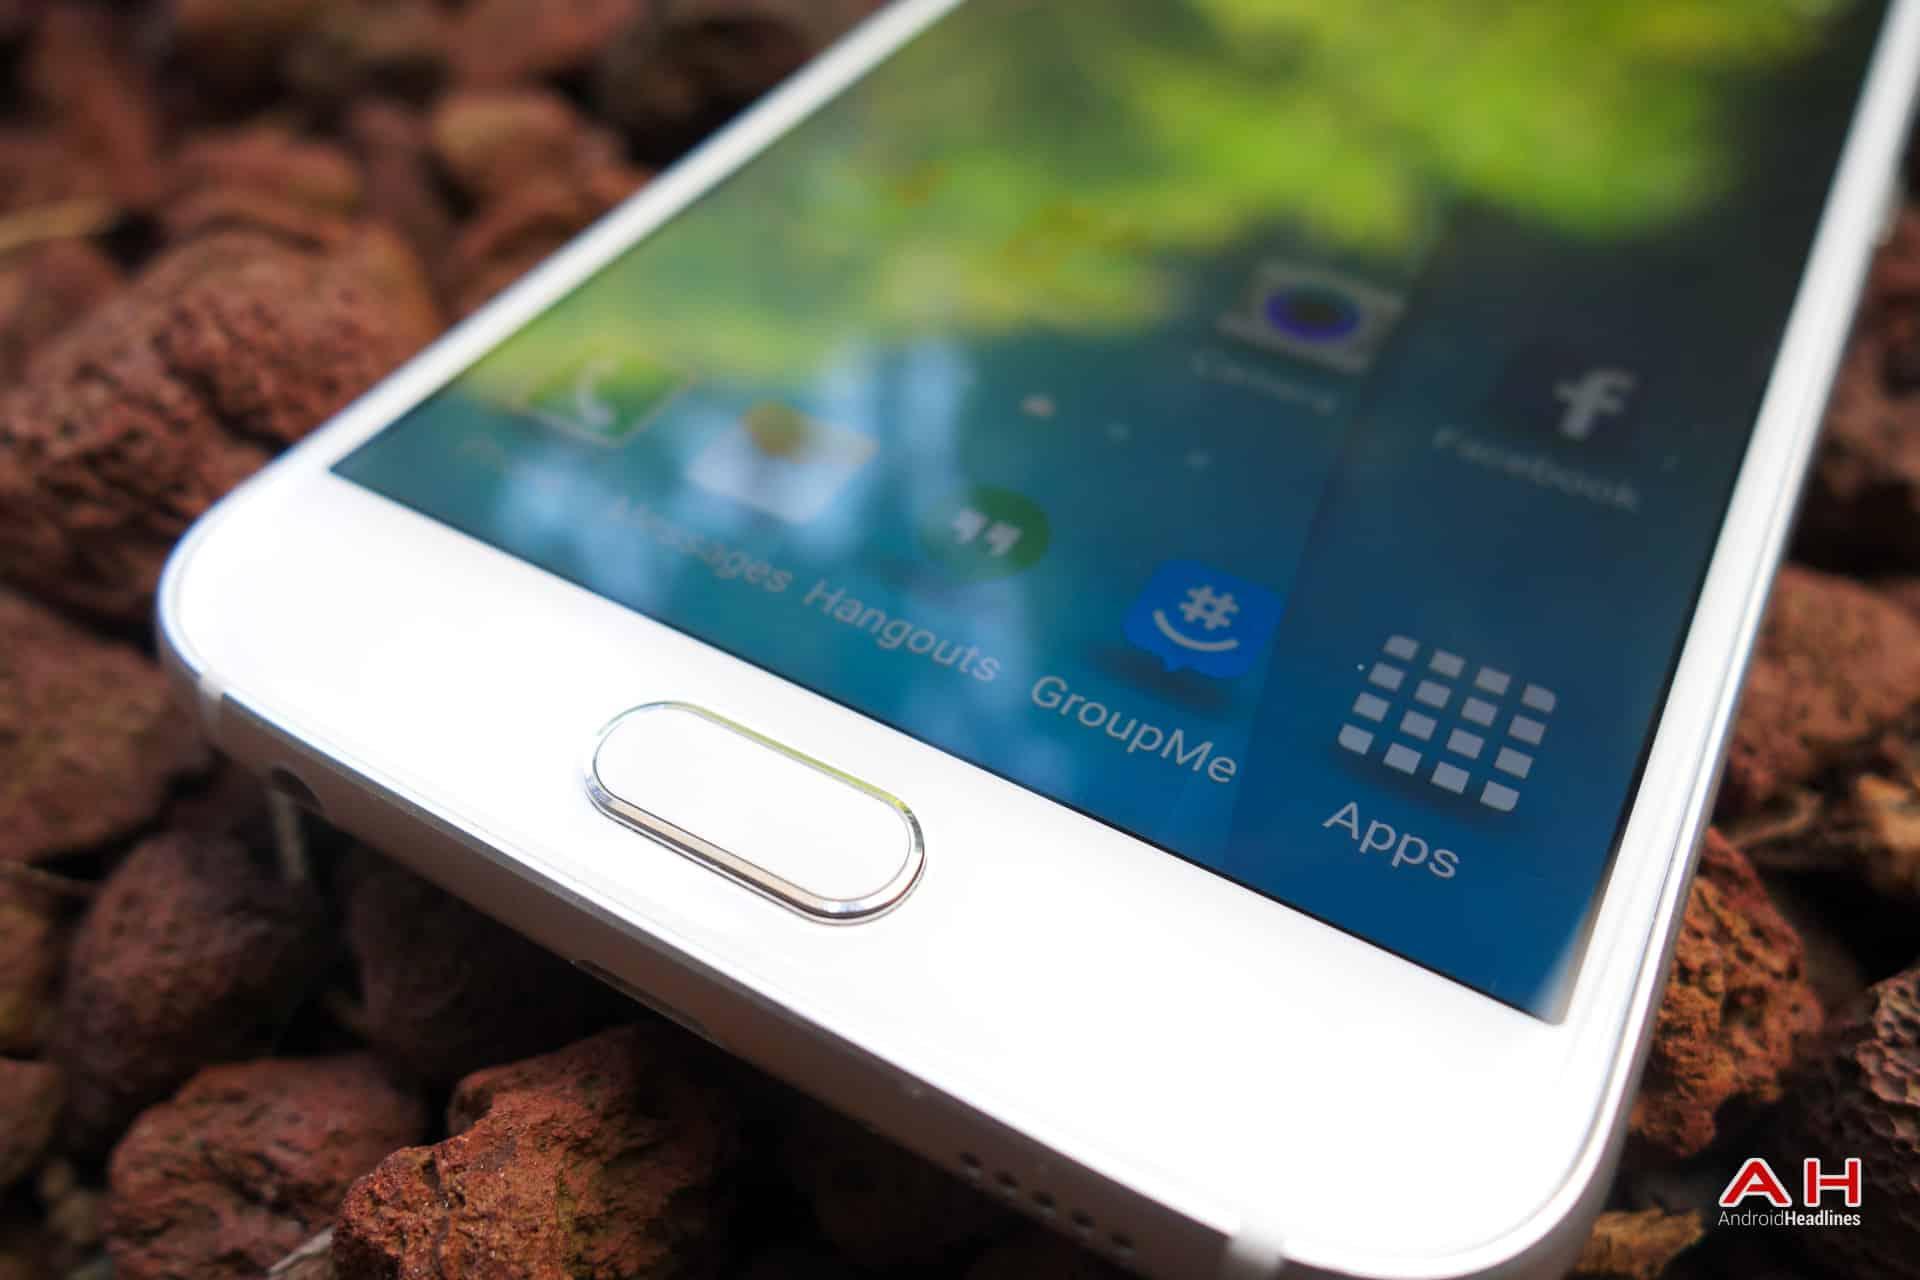 AH Samsung Galaxy S6-28